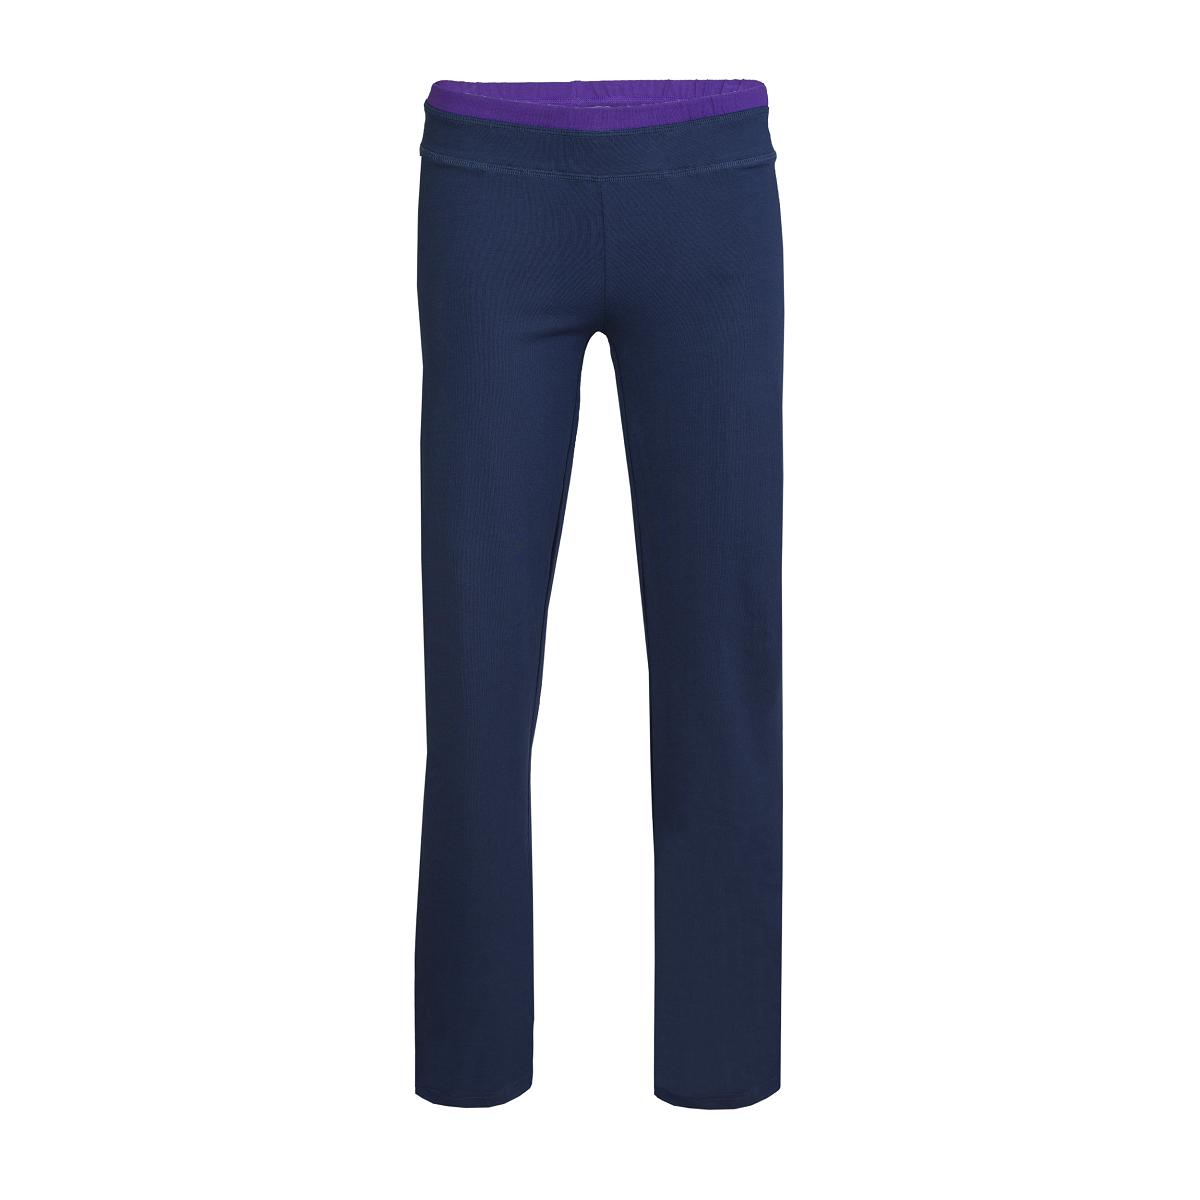 Ženske hlače, temno modra